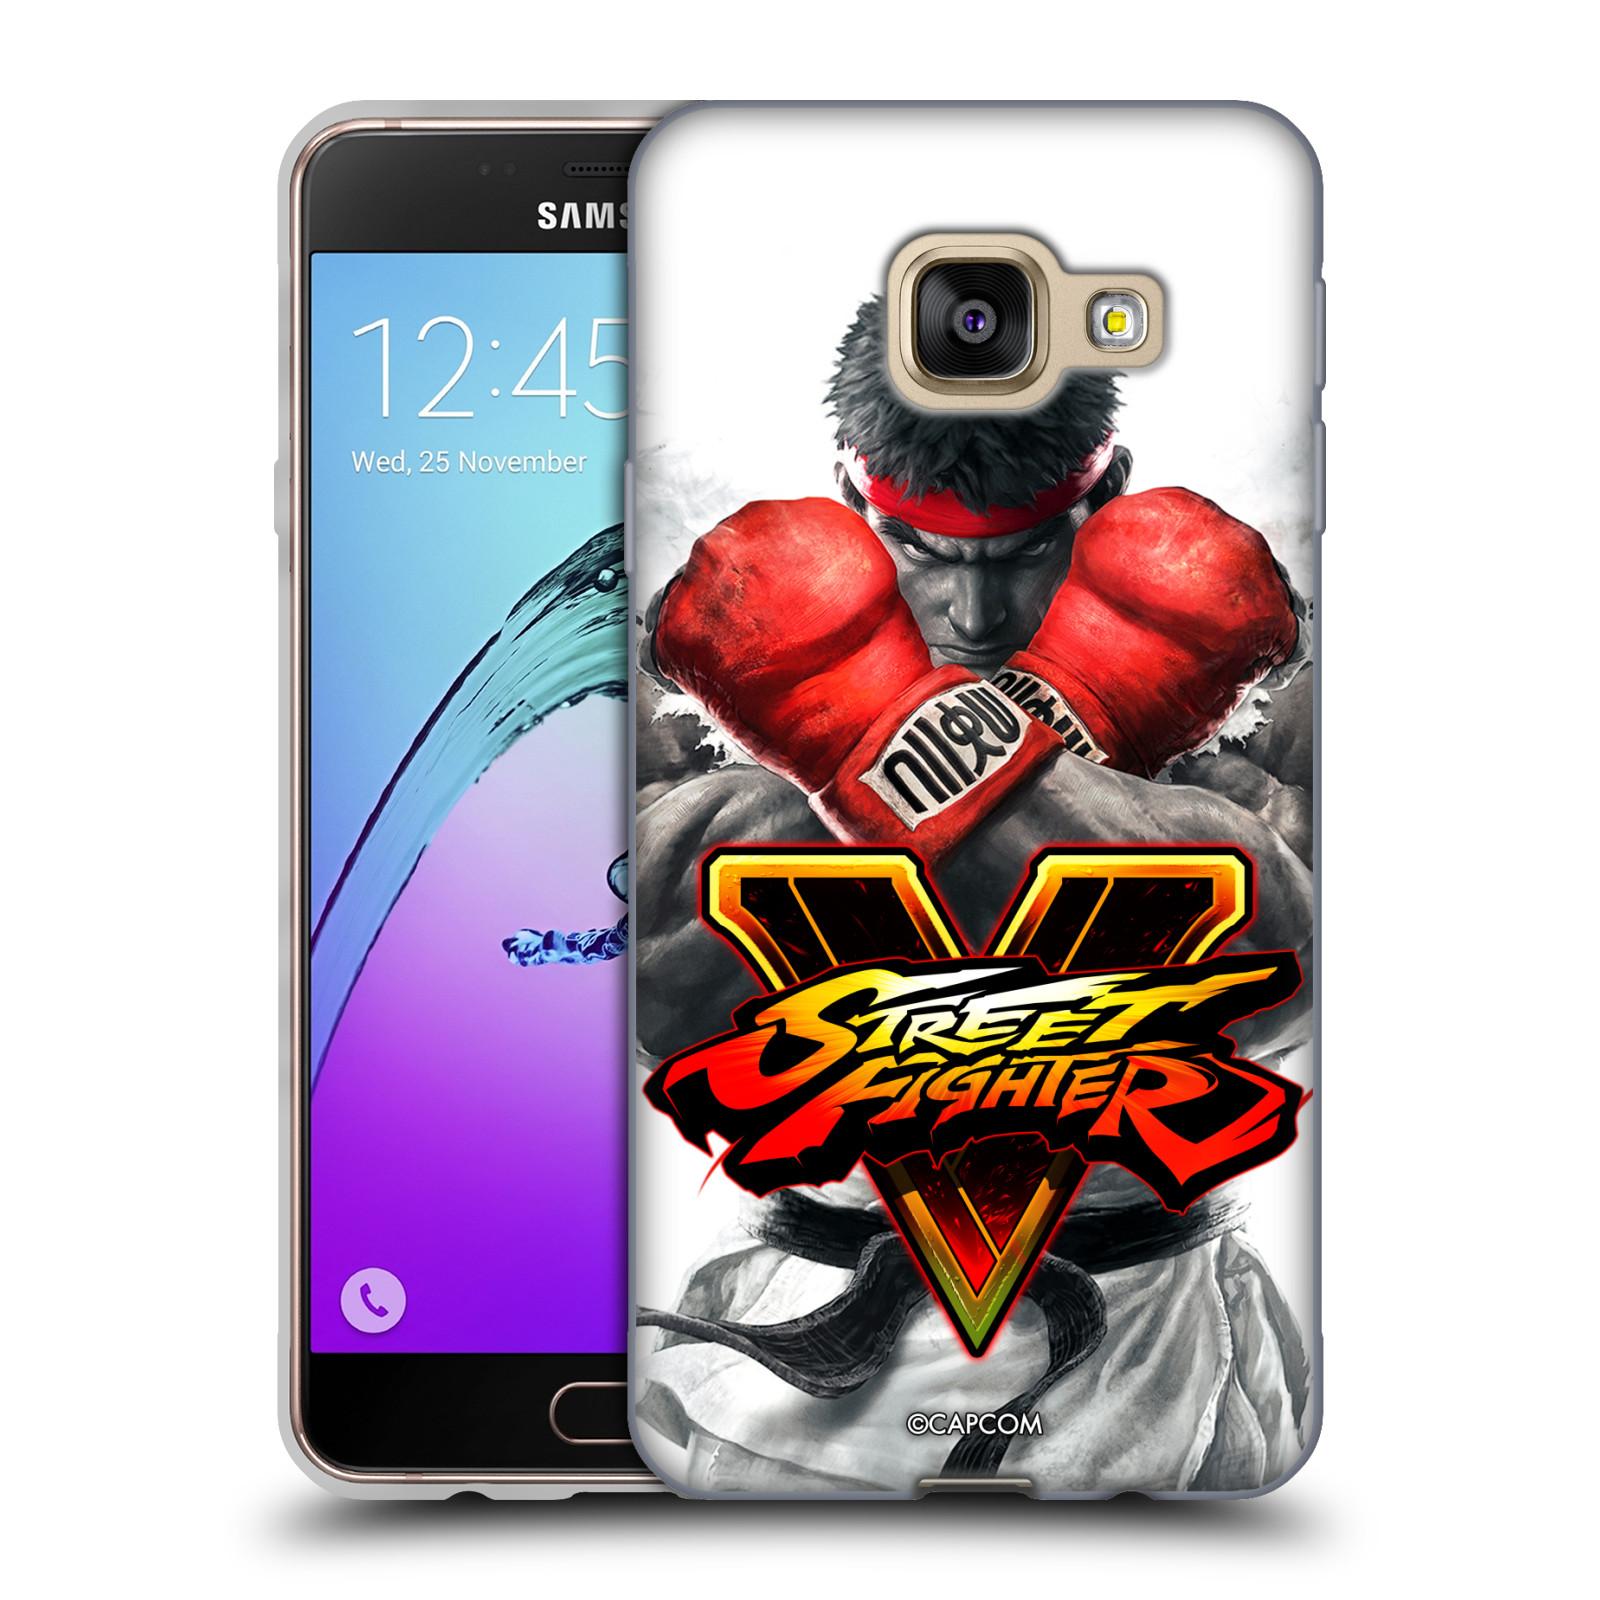 HEAD CASE silikonový obal na mobil Samsung Galaxy A3 2016 (A310) oficiální kryt STREET FIGHTER Boxer Ryu